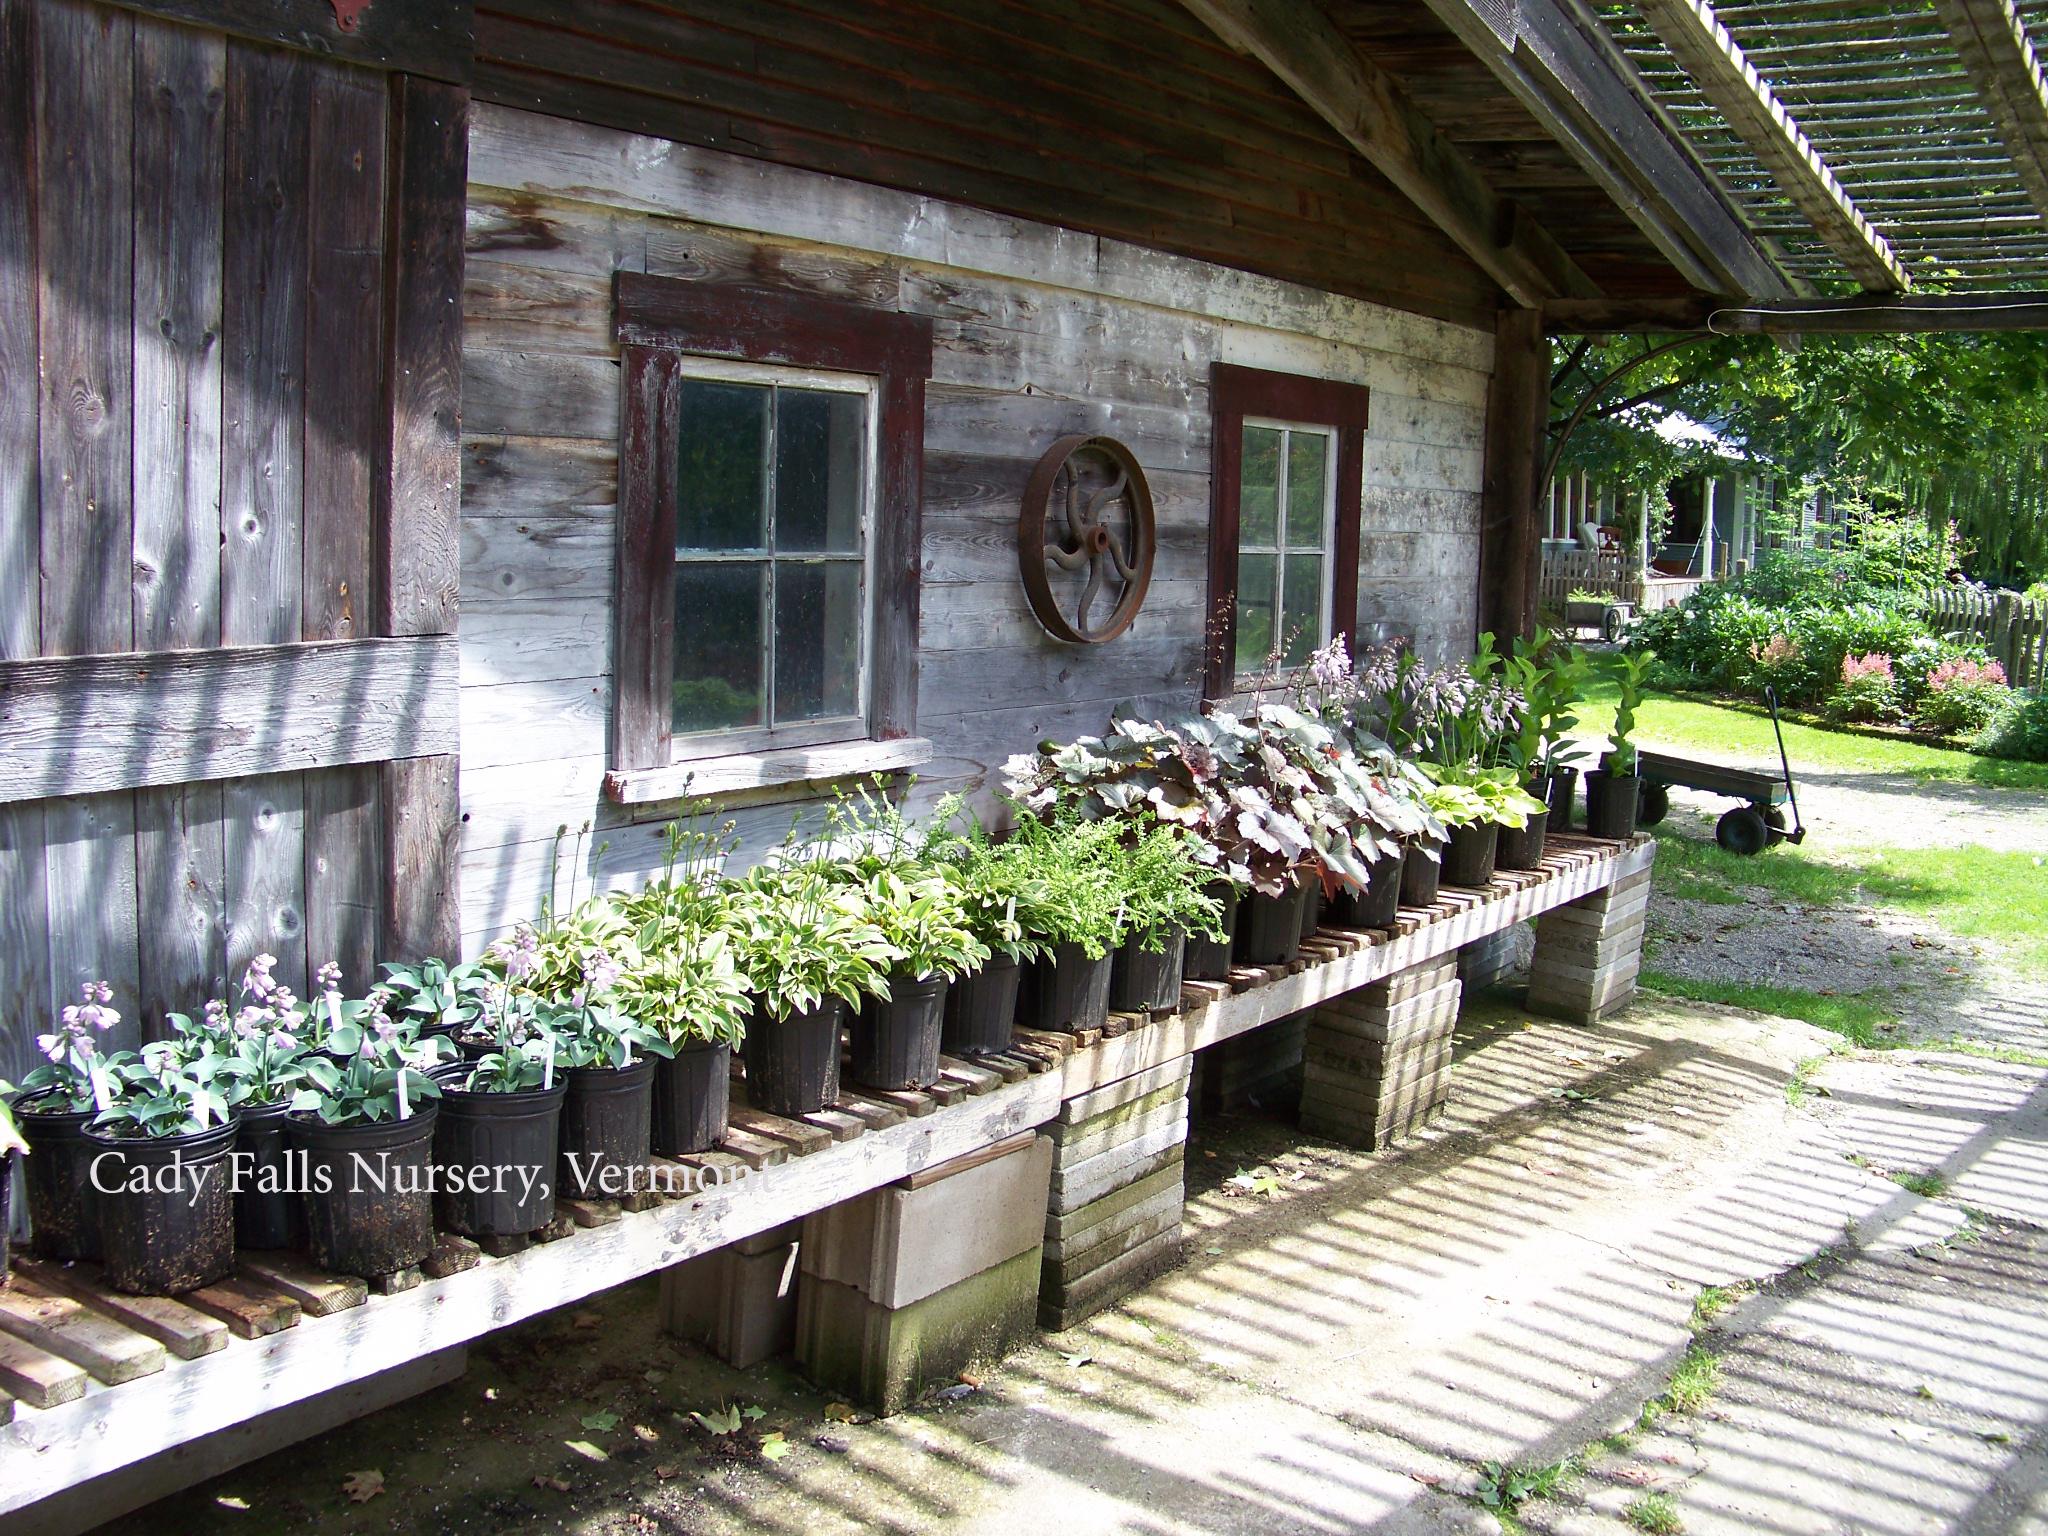 Cady Falls Nursery Part 2